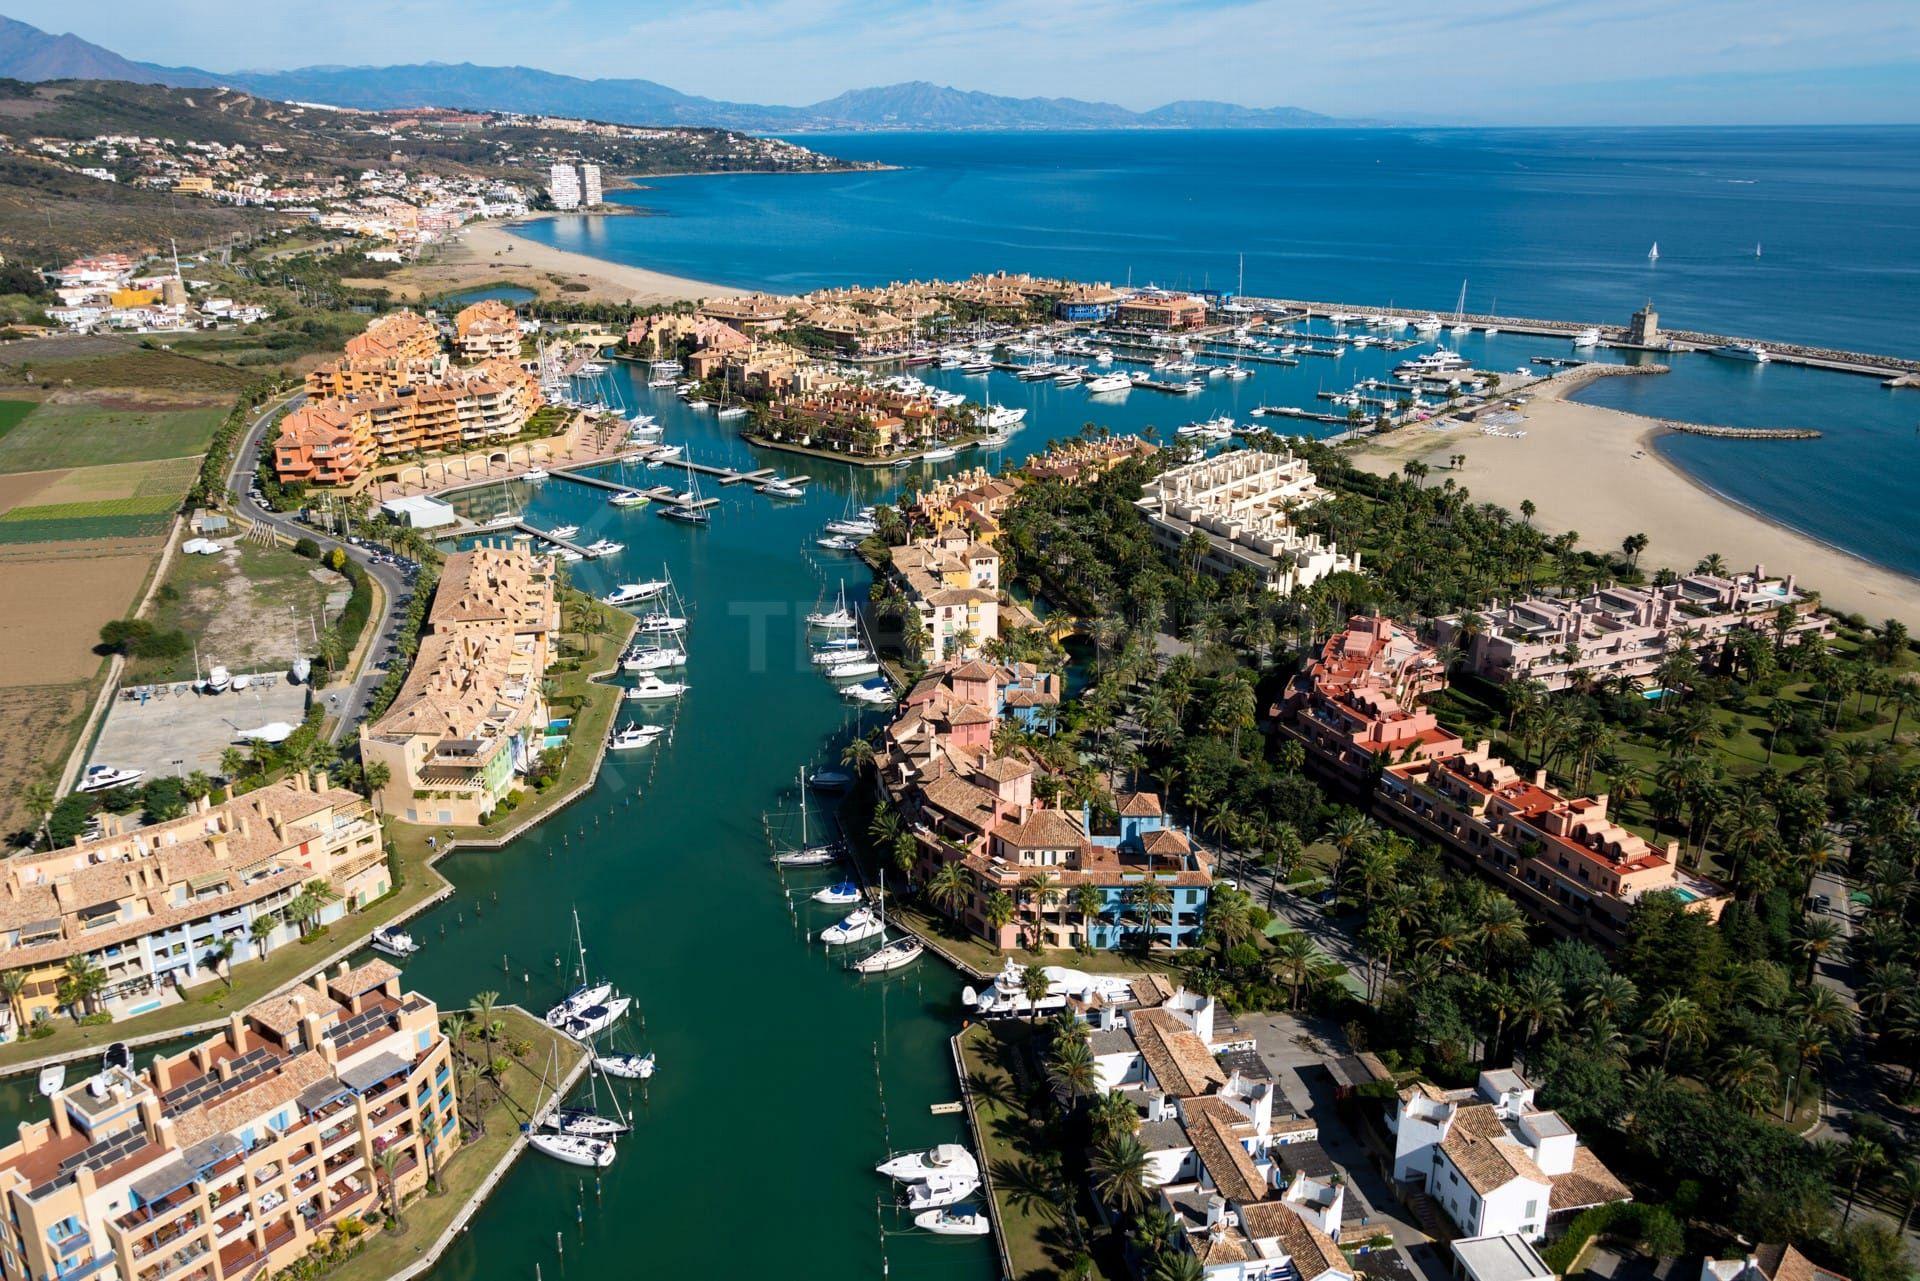 Sotogrande: luxury enclave where the sun sets on the Costa del Sol